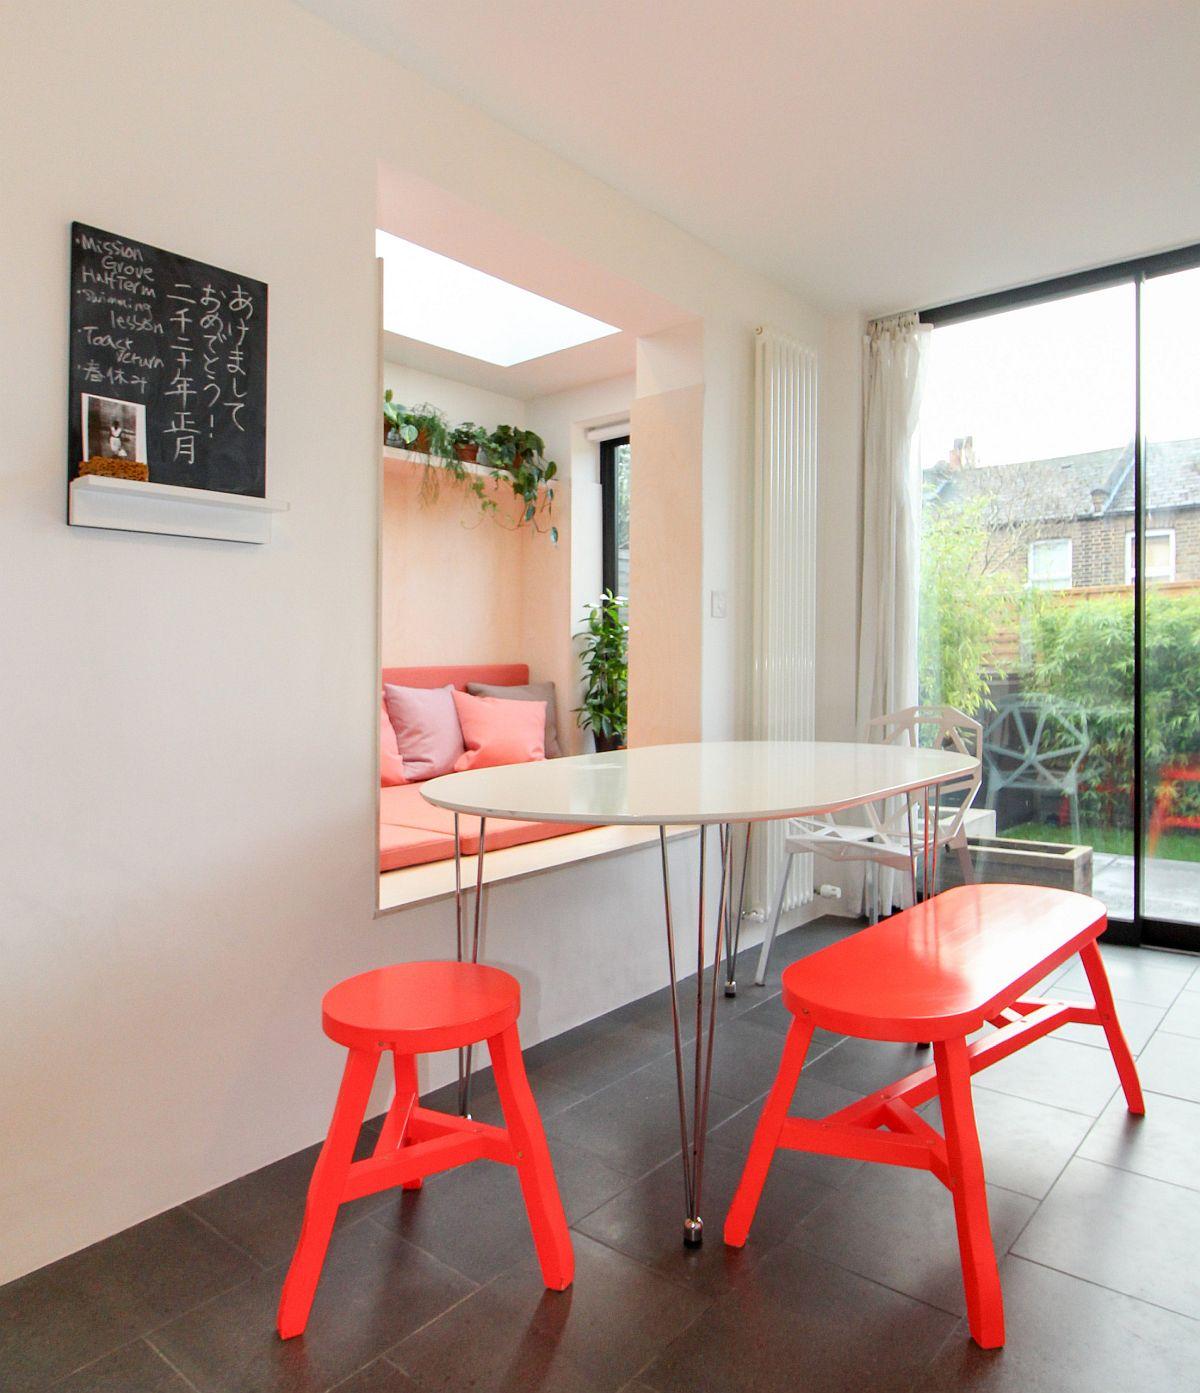 Innovative modern beakfast nook with splashes of red all around